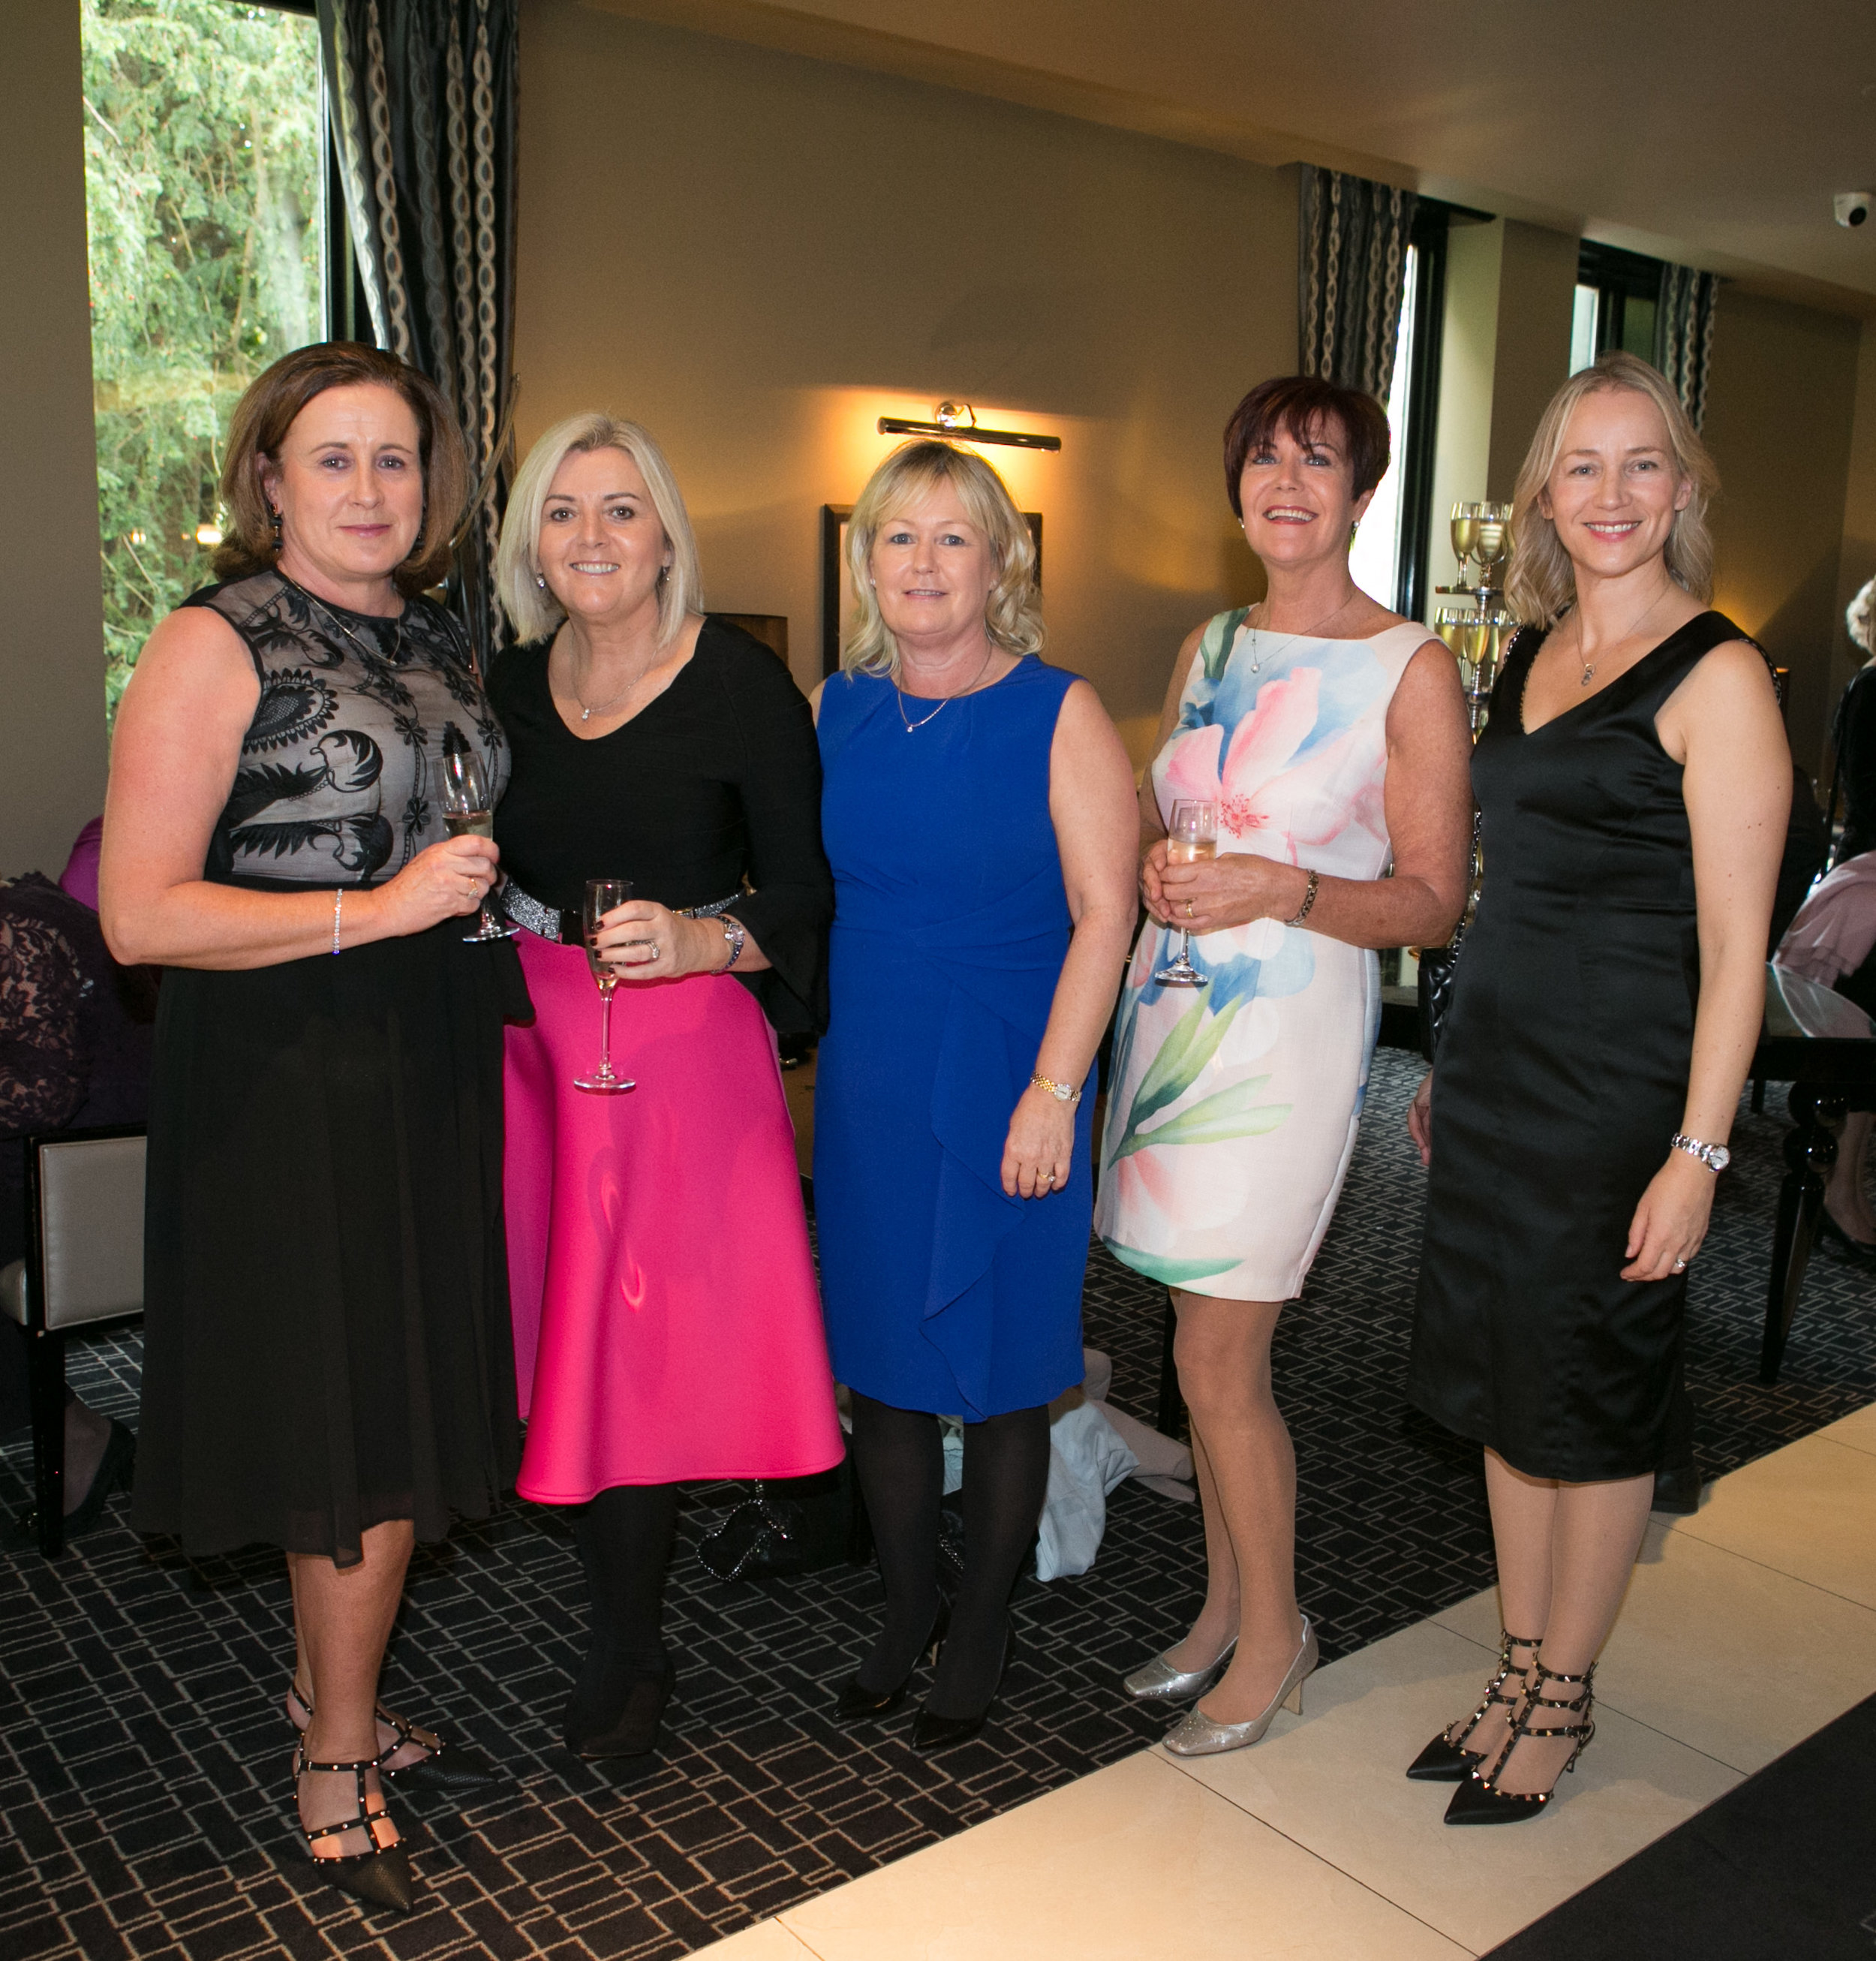 Geraldine Hallissey, Caroline Walsh, Deirdre Lynch, Trish Phelan and Eadaoin Glynn all from Maryborough Woods at the Annual Aer Lingus Autumn Lunch in aid of Cork ARC Cancer Support House.